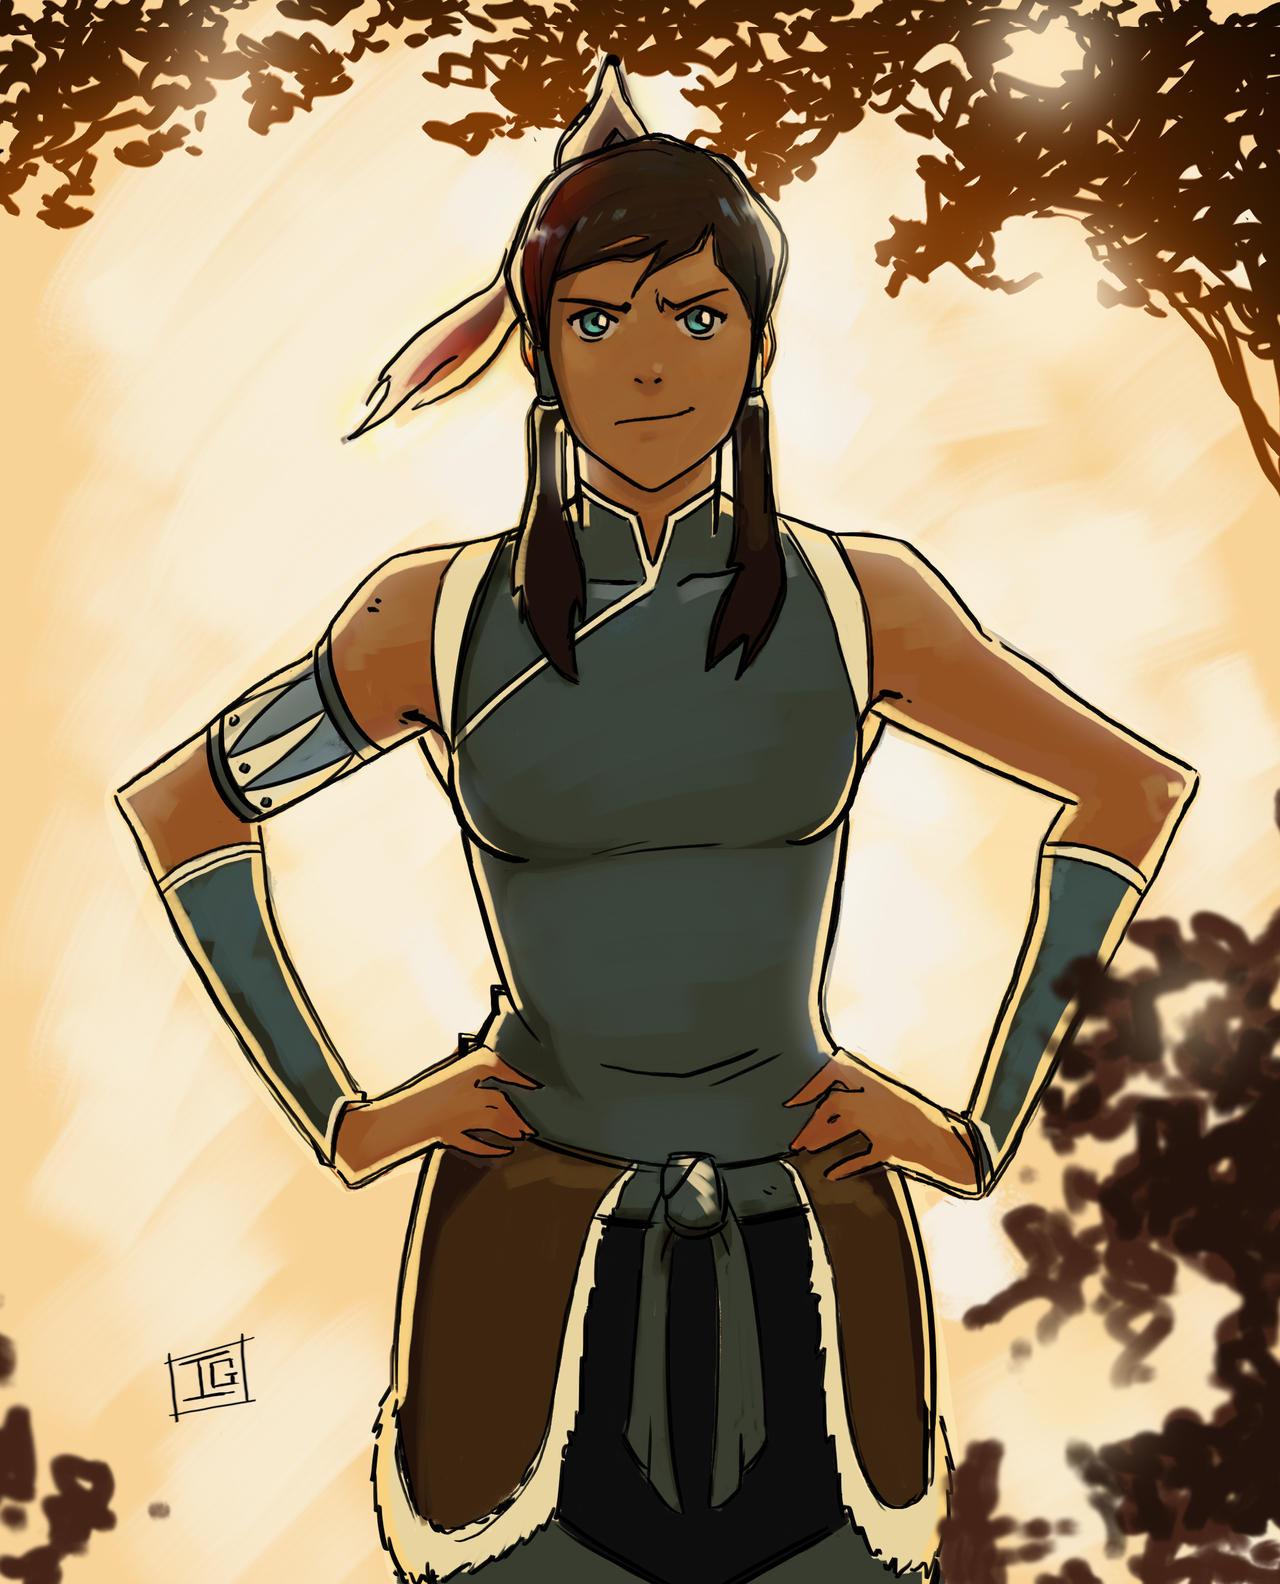 Avatar 2 Hype: Avatar: The Legend Of Korra